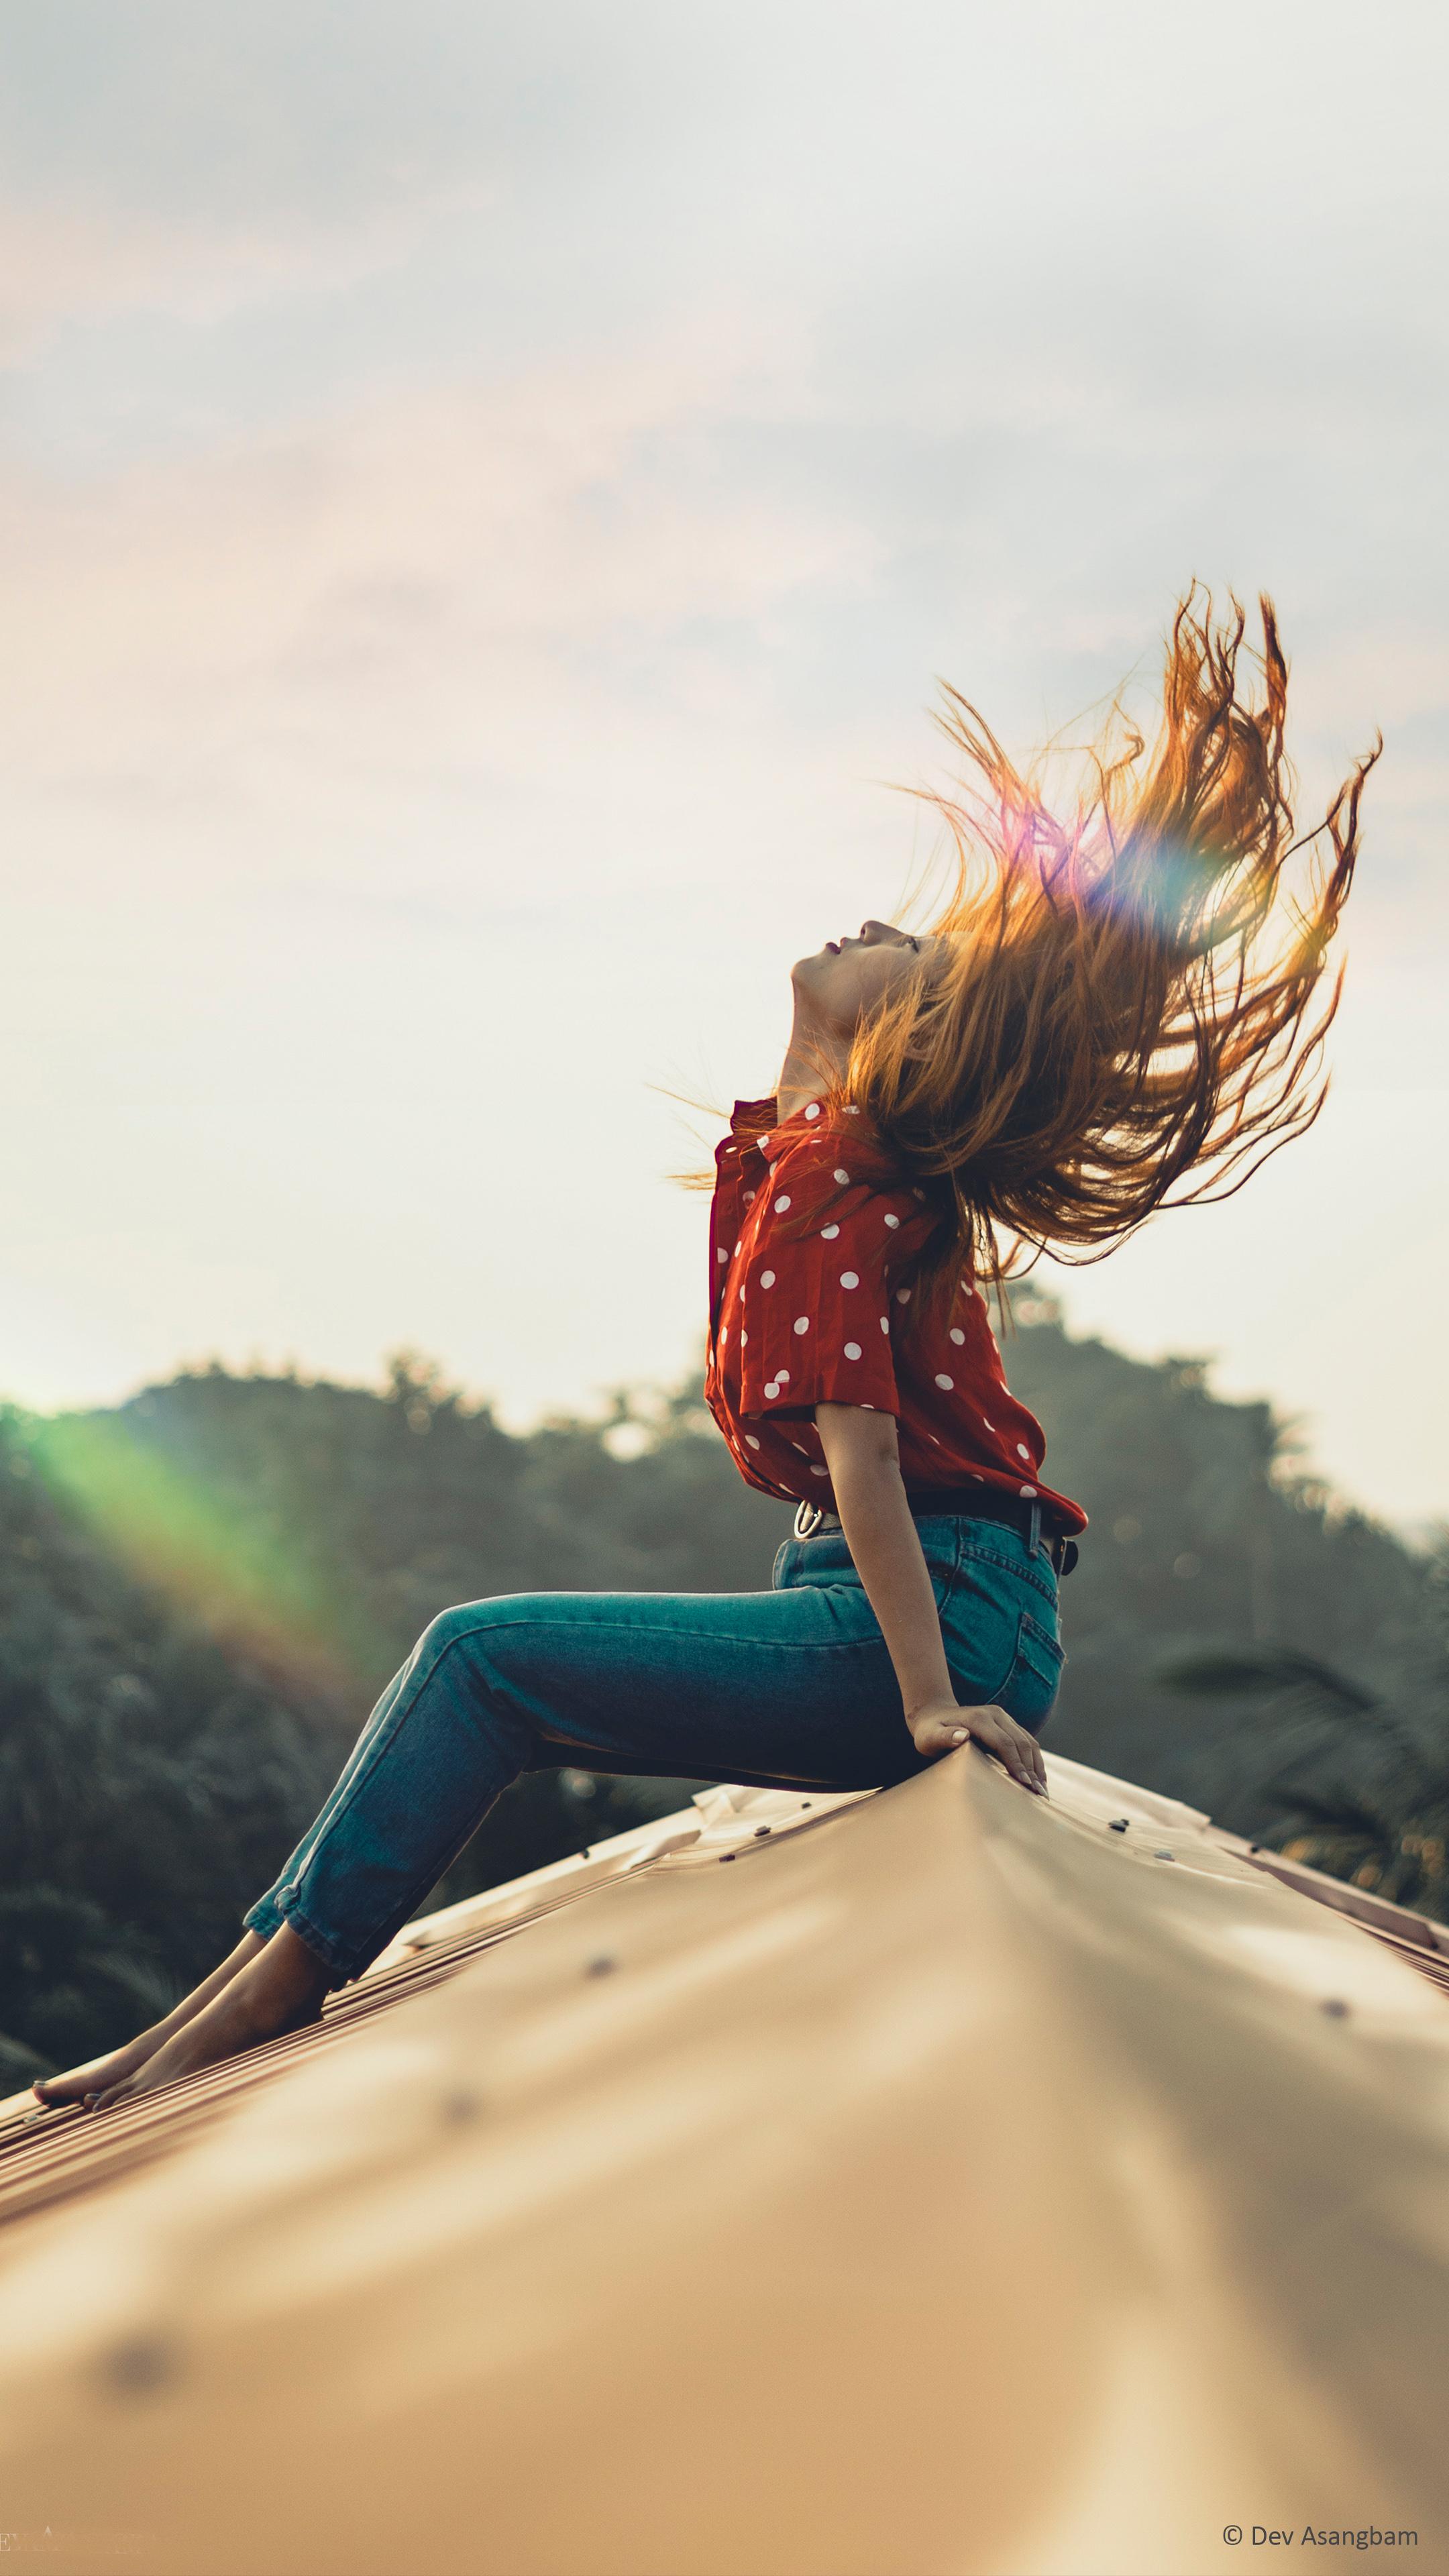 Girl Hair Flip Sunray Photography 4k Ultra Hd Mobile Wallpaper